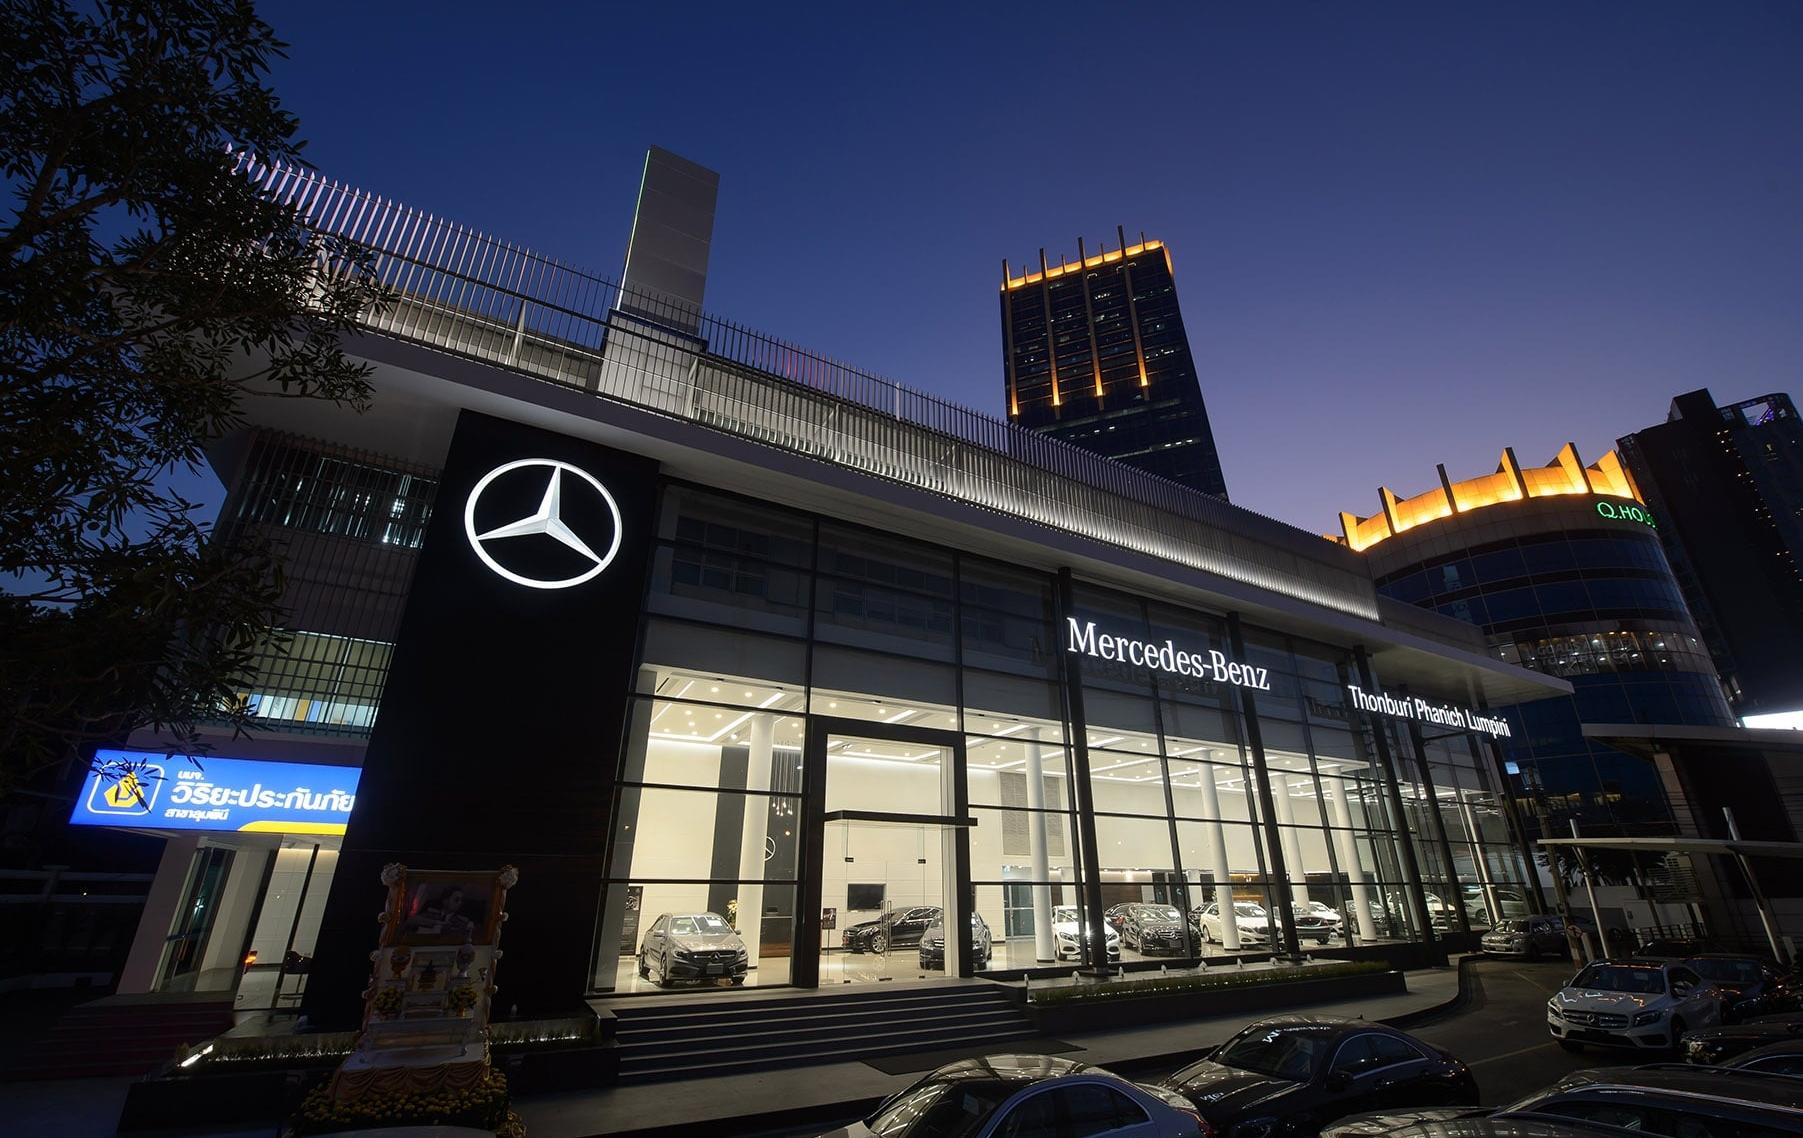 Mercedes Benz Showroom, Bangkok, Thailand